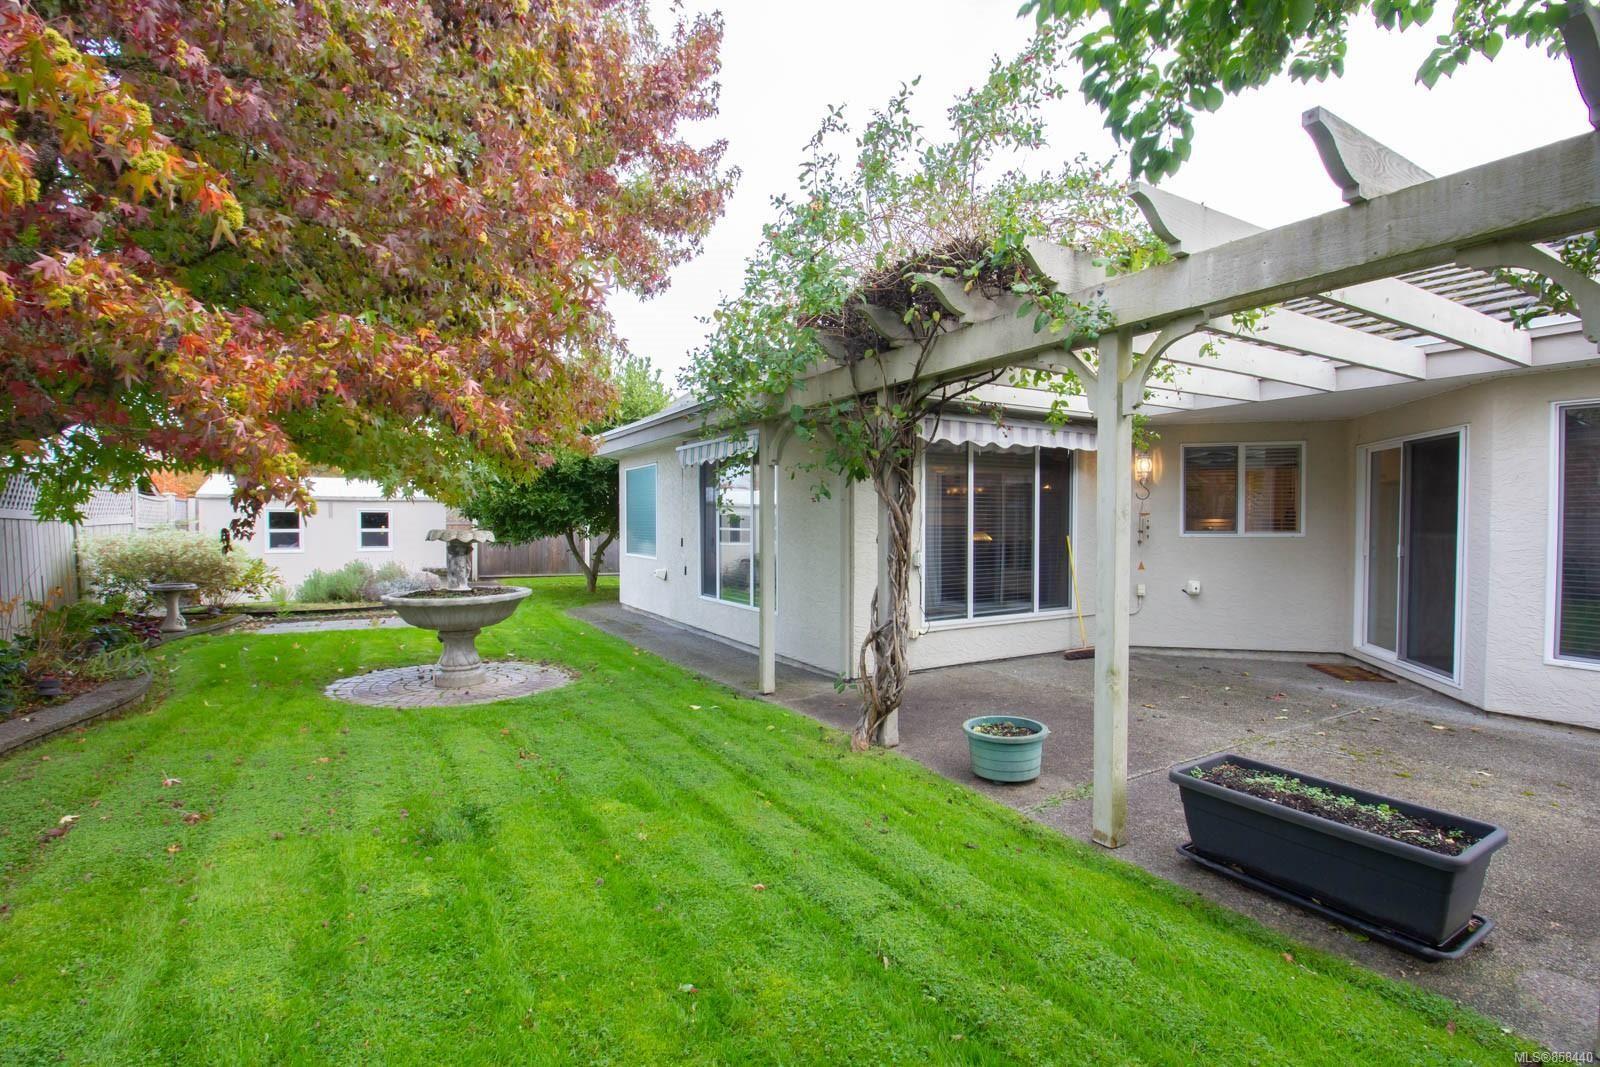 Photo 27: Photos: 798 Devon Pl in : PQ Qualicum Beach House for sale (Parksville/Qualicum)  : MLS®# 858440